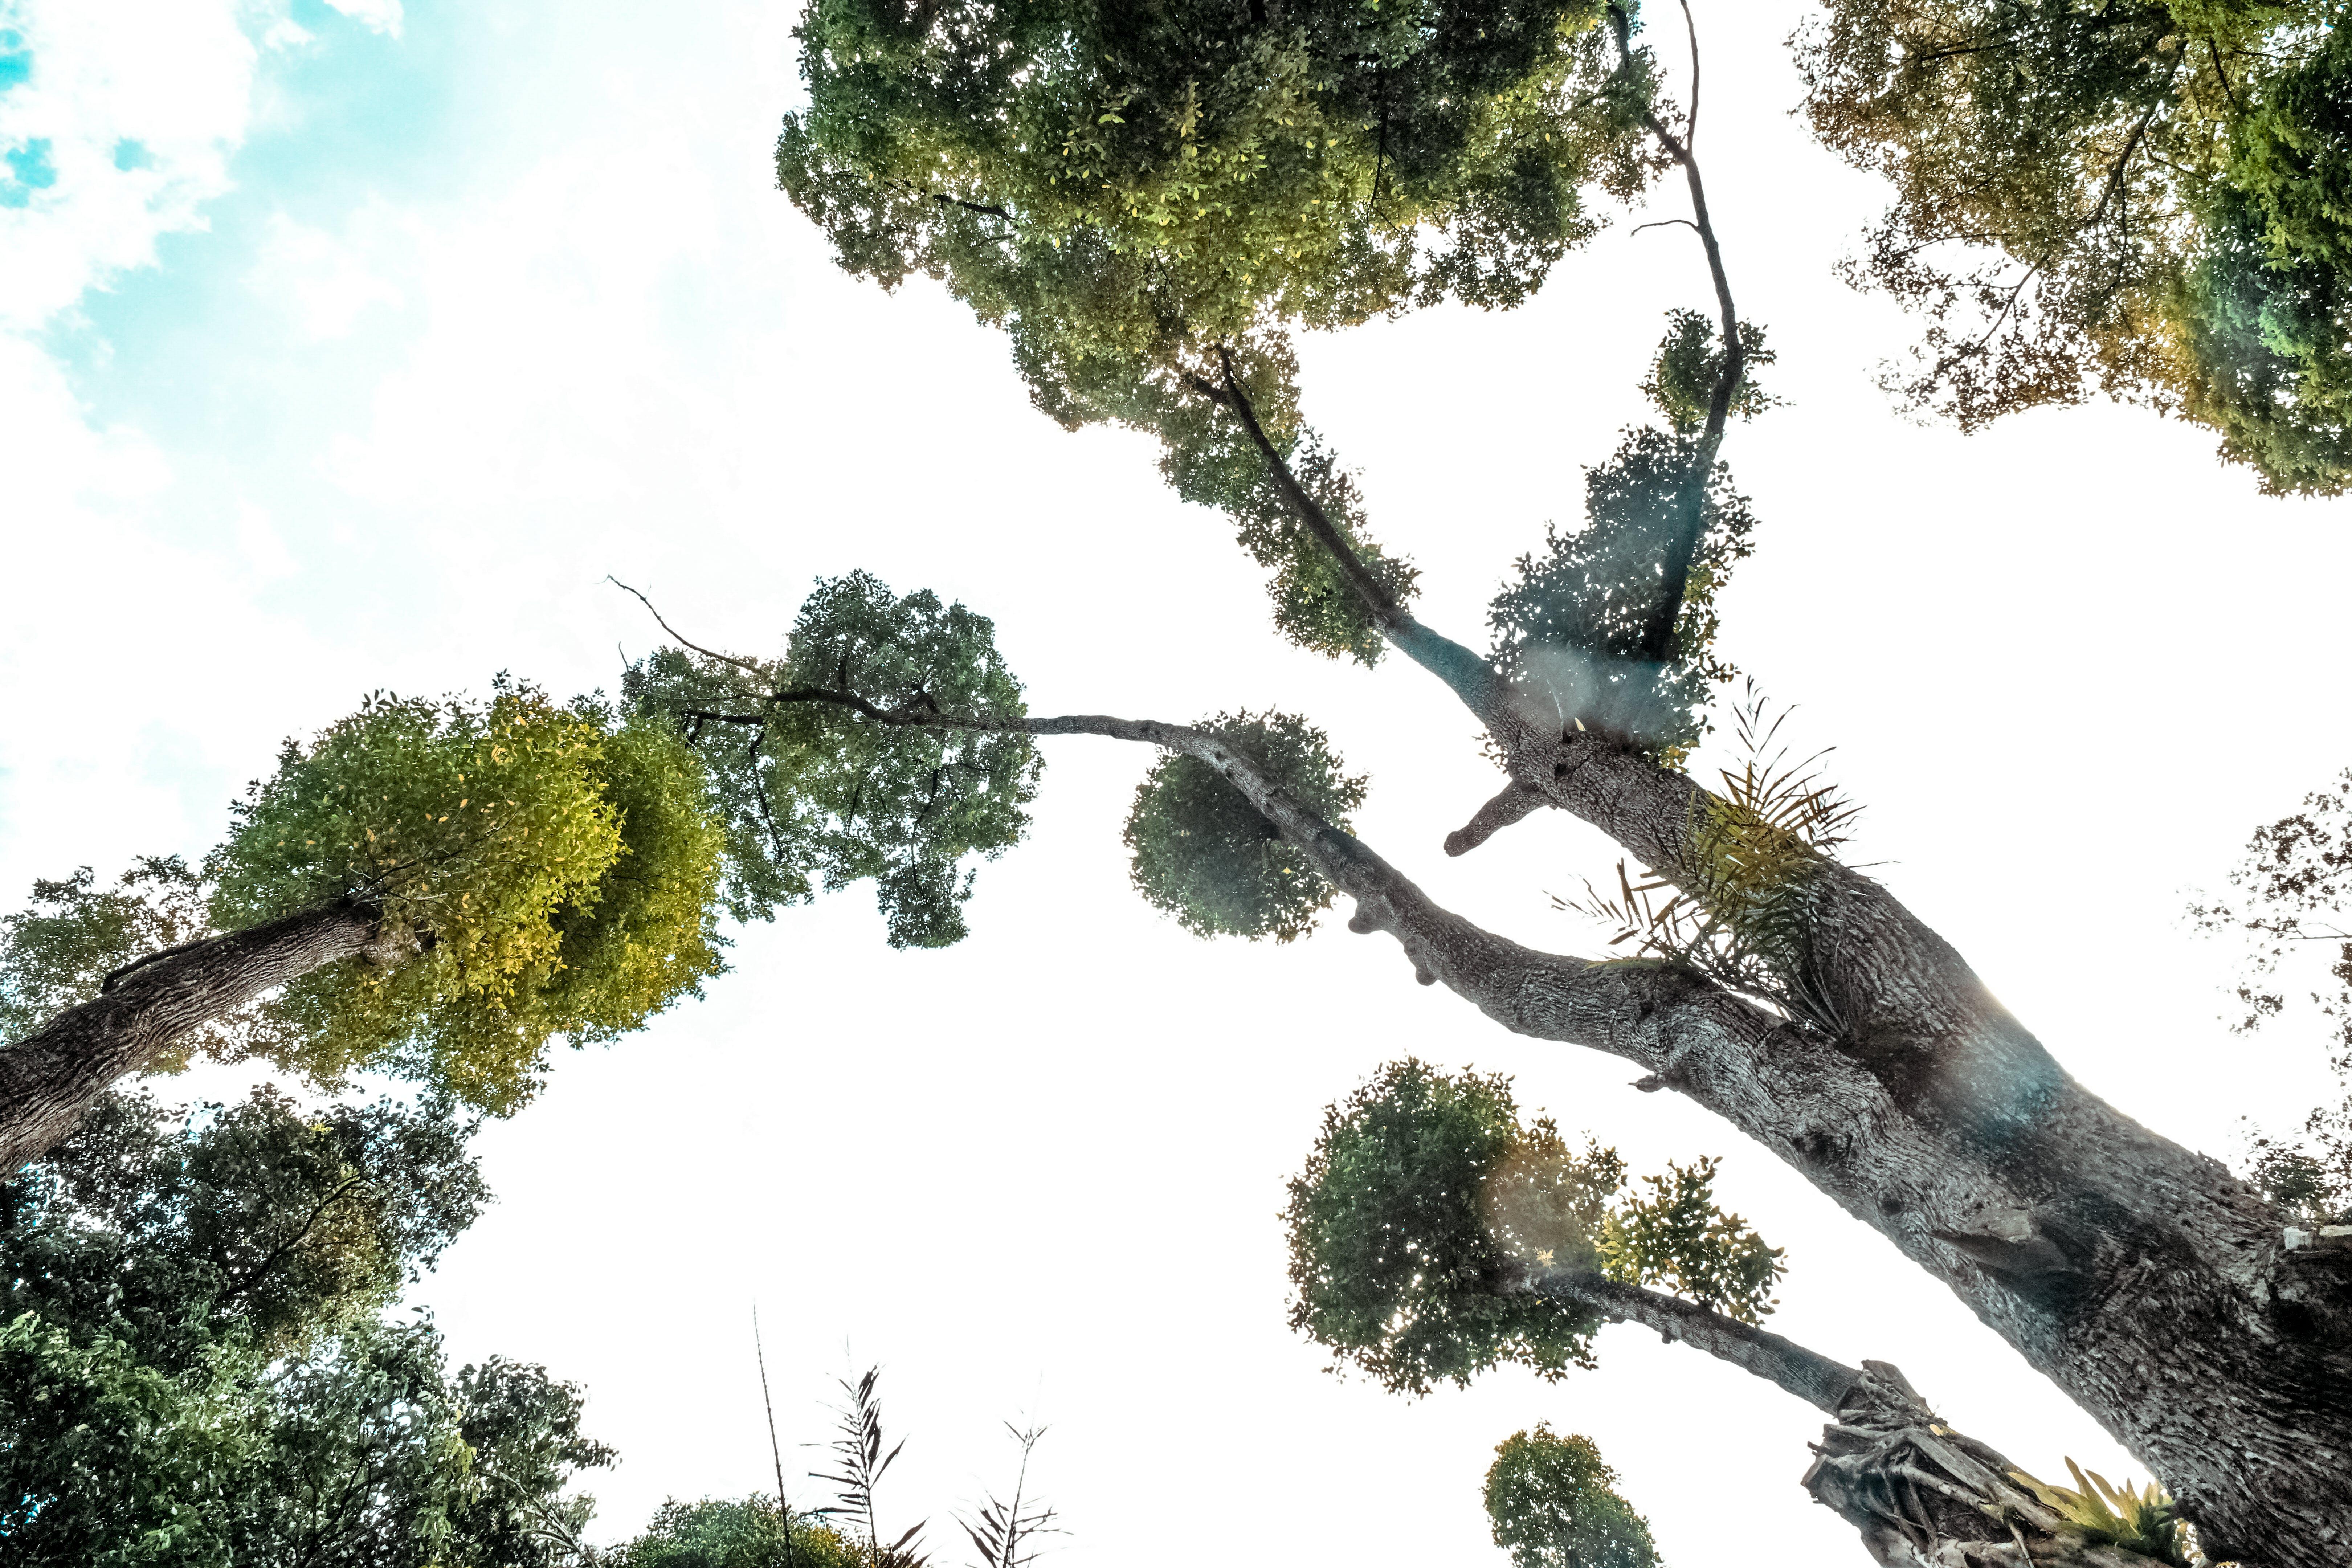 Kostenloses Stock Foto zu natur, himmel, bäume, pflanzen